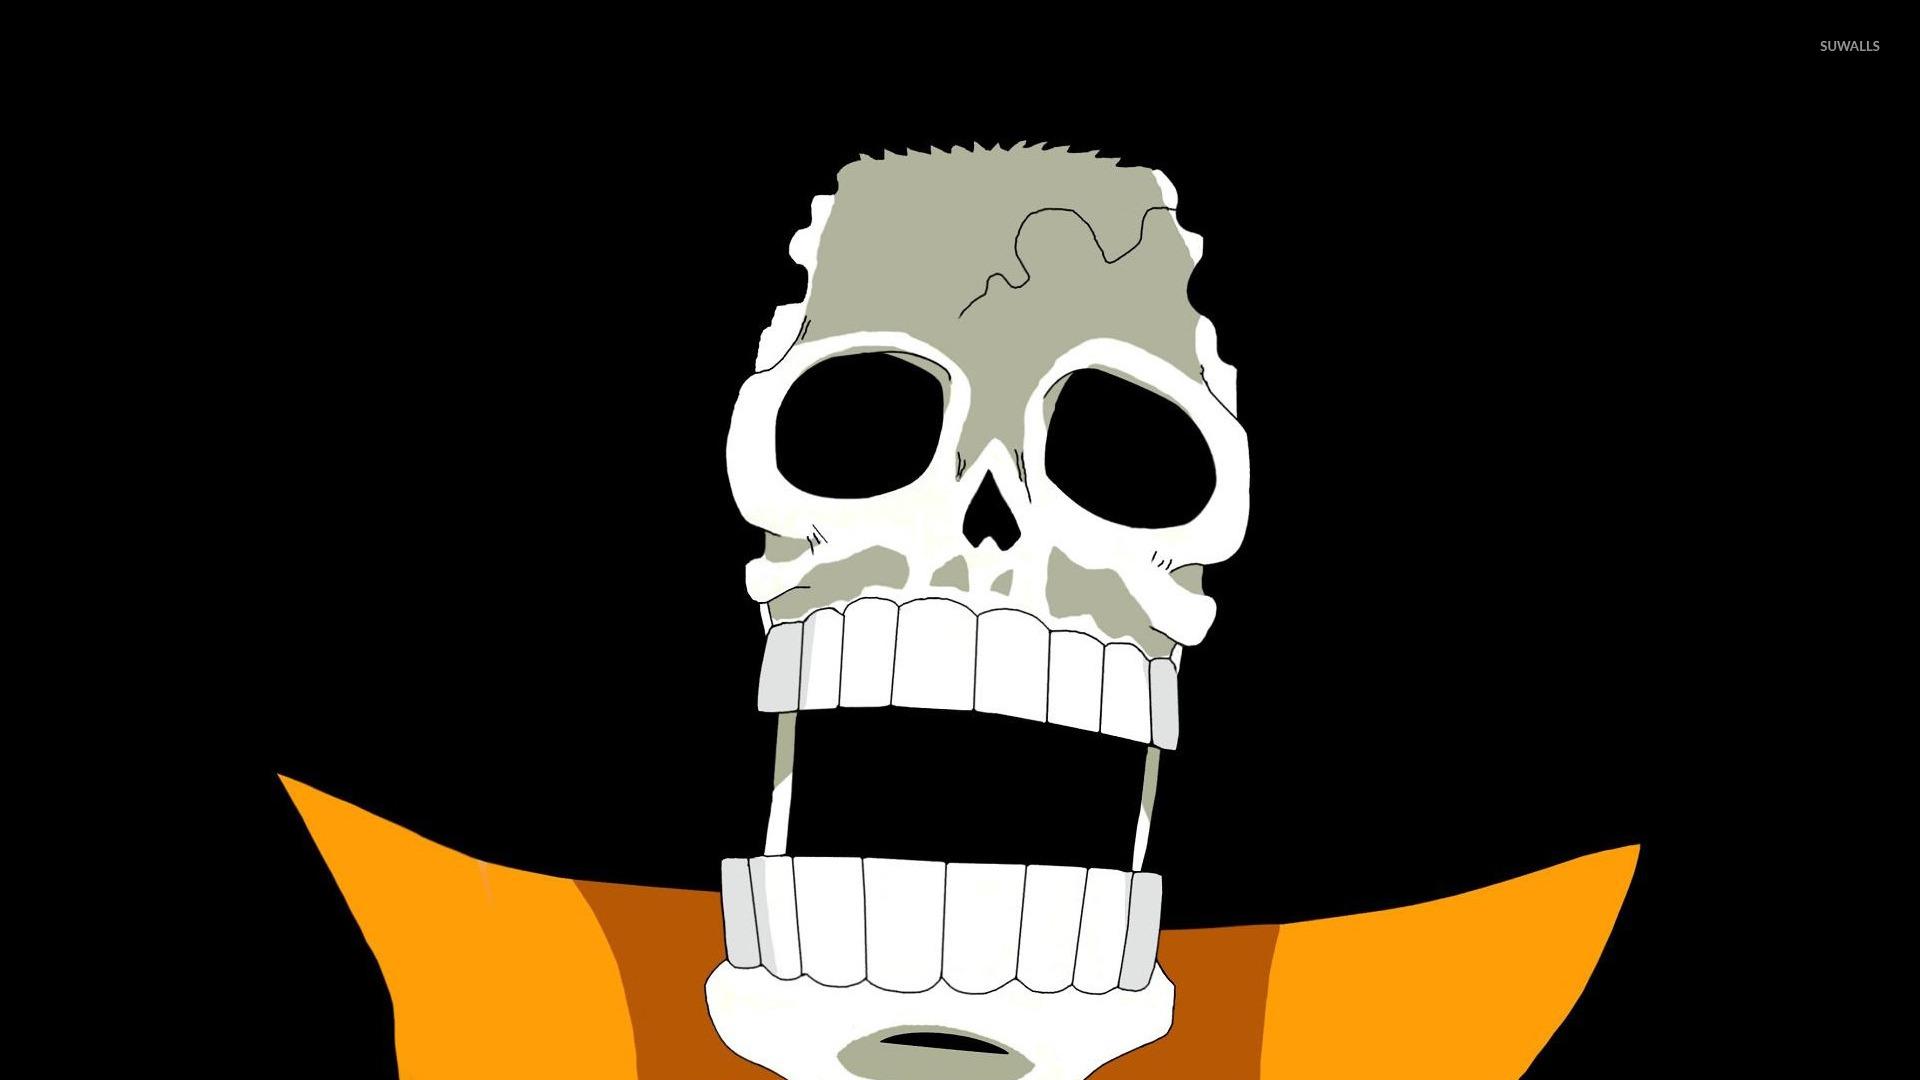 Brook   One Piece wallpaper   Cartoon wallpapers   15193 1920x1080